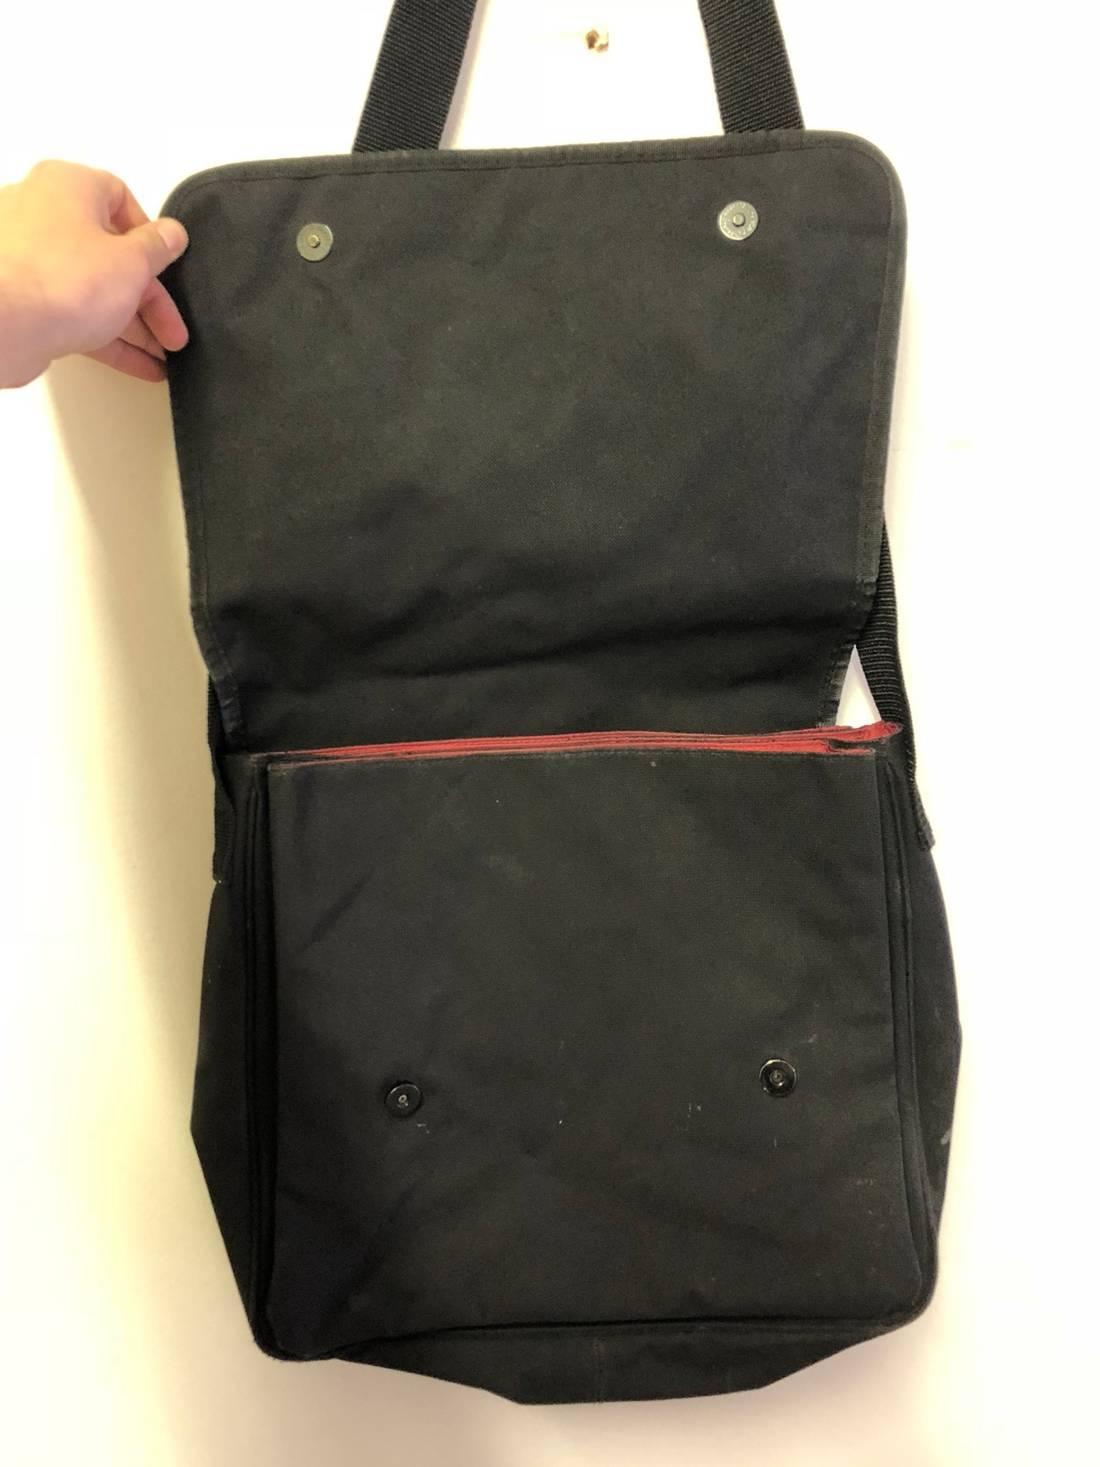 6c931eb8c5c1 ... denmark polo ralph lauren cool polo sport side bag size one size 3  6ef88 99d7d